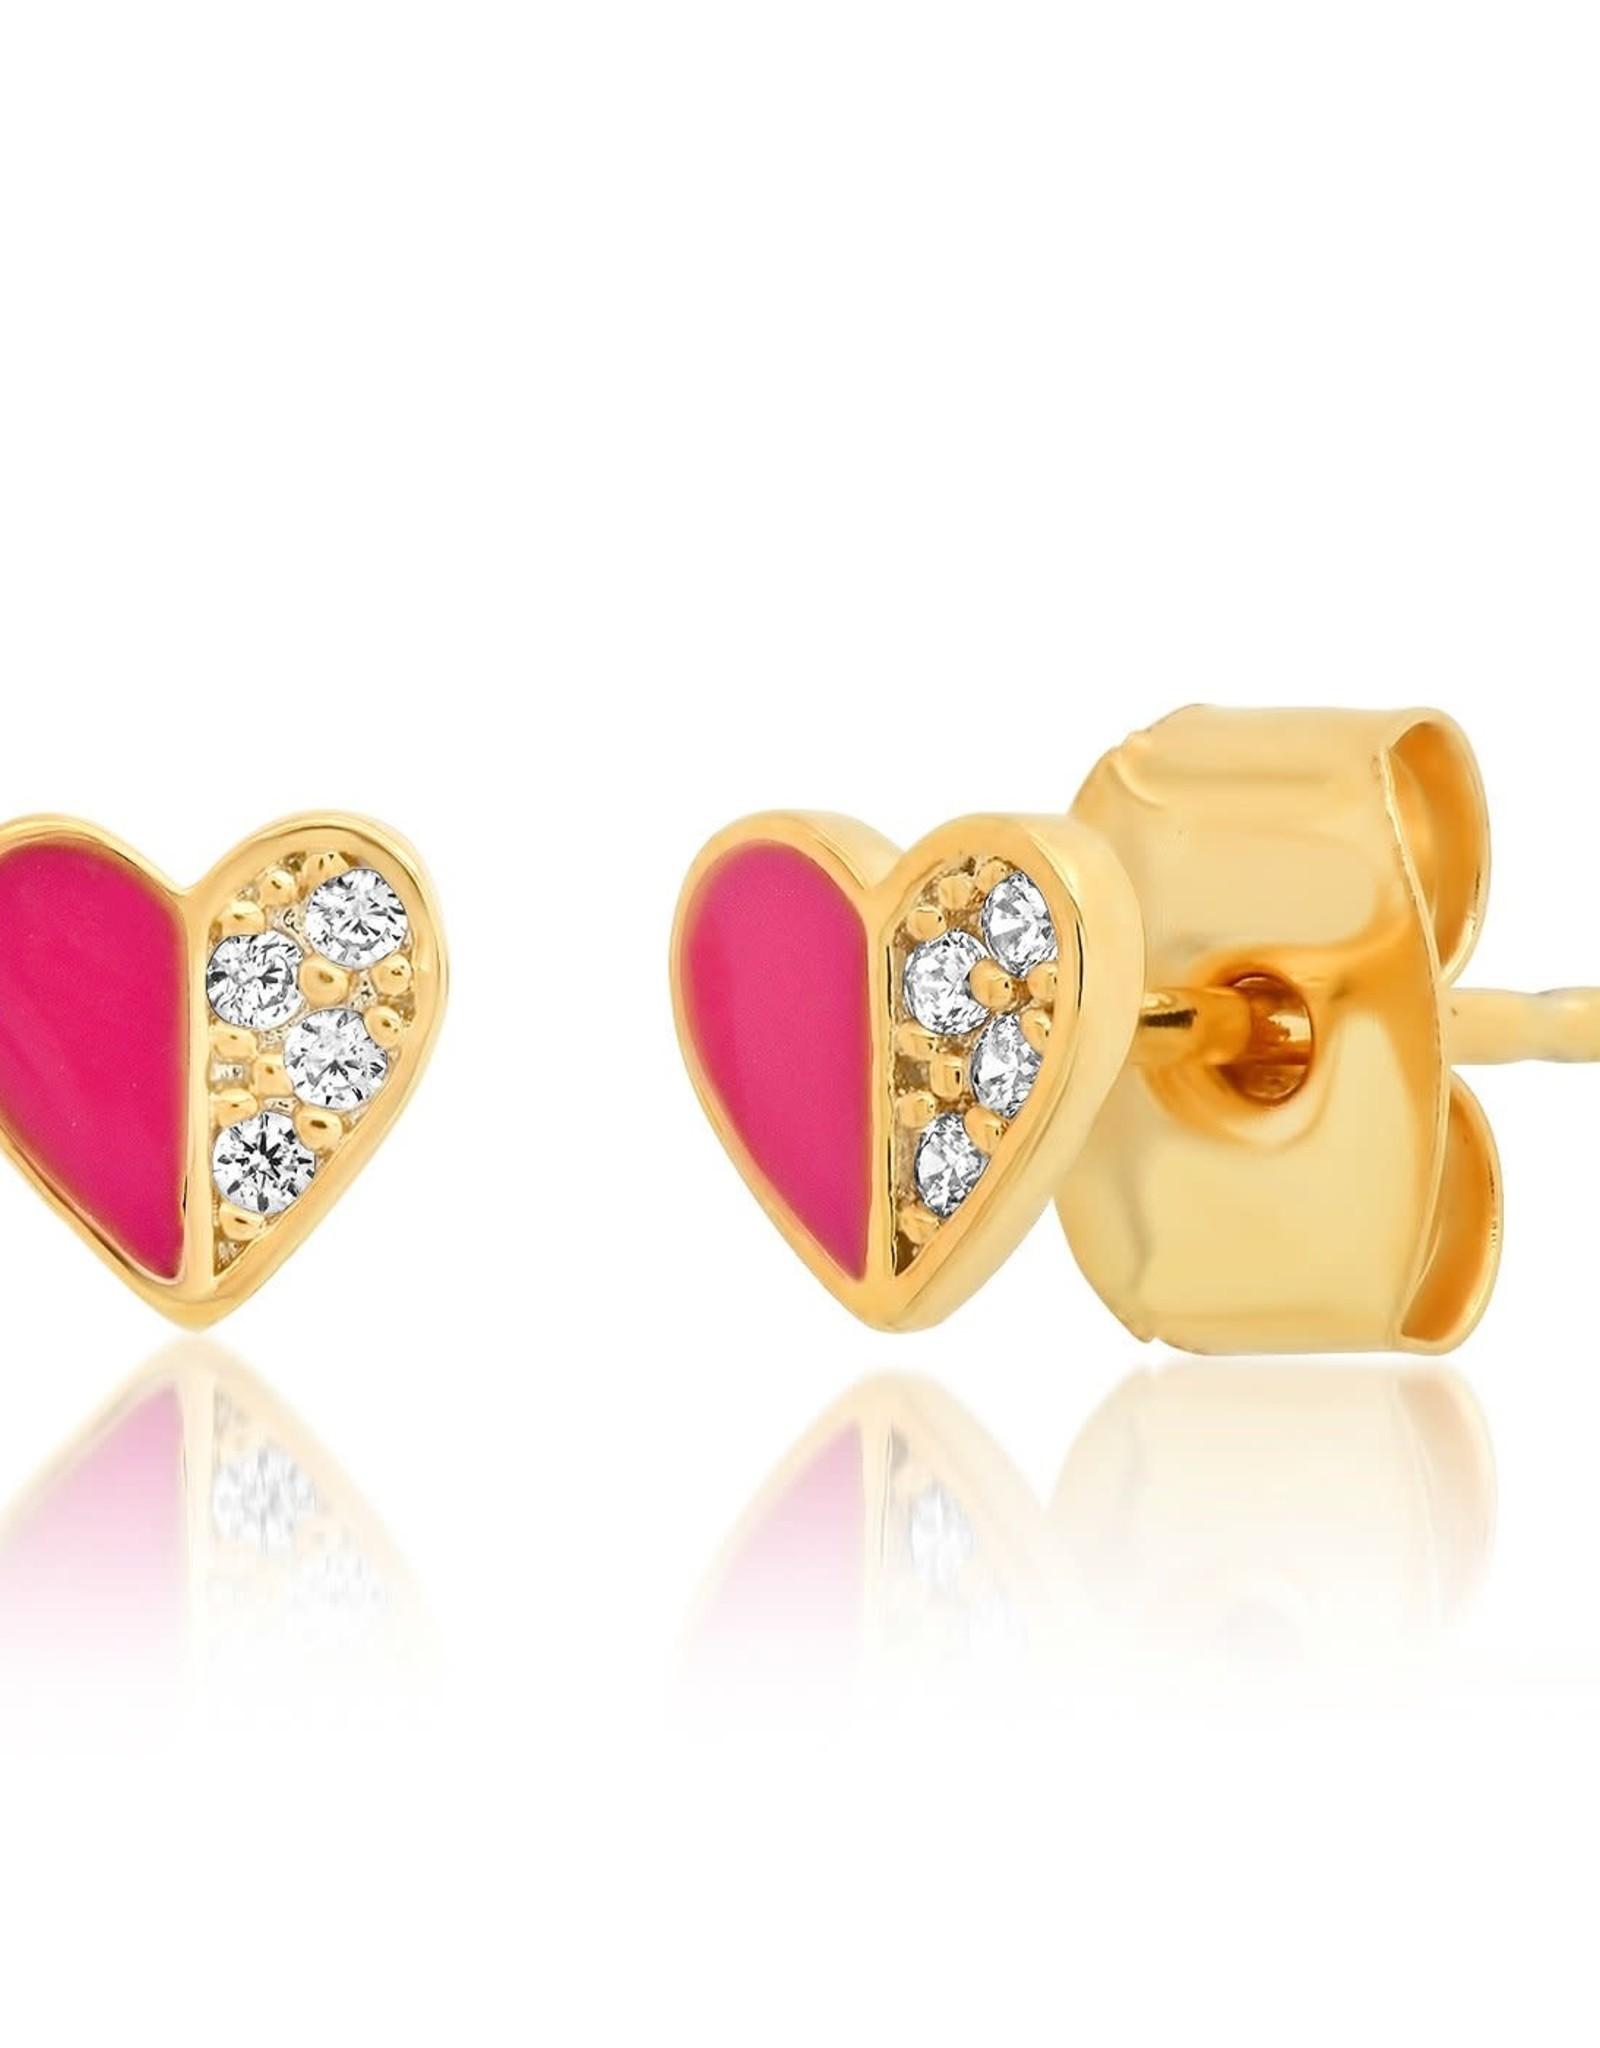 Tai Jewelry Tai Heart Enamel with CZ Earring Style TE-2846PINK